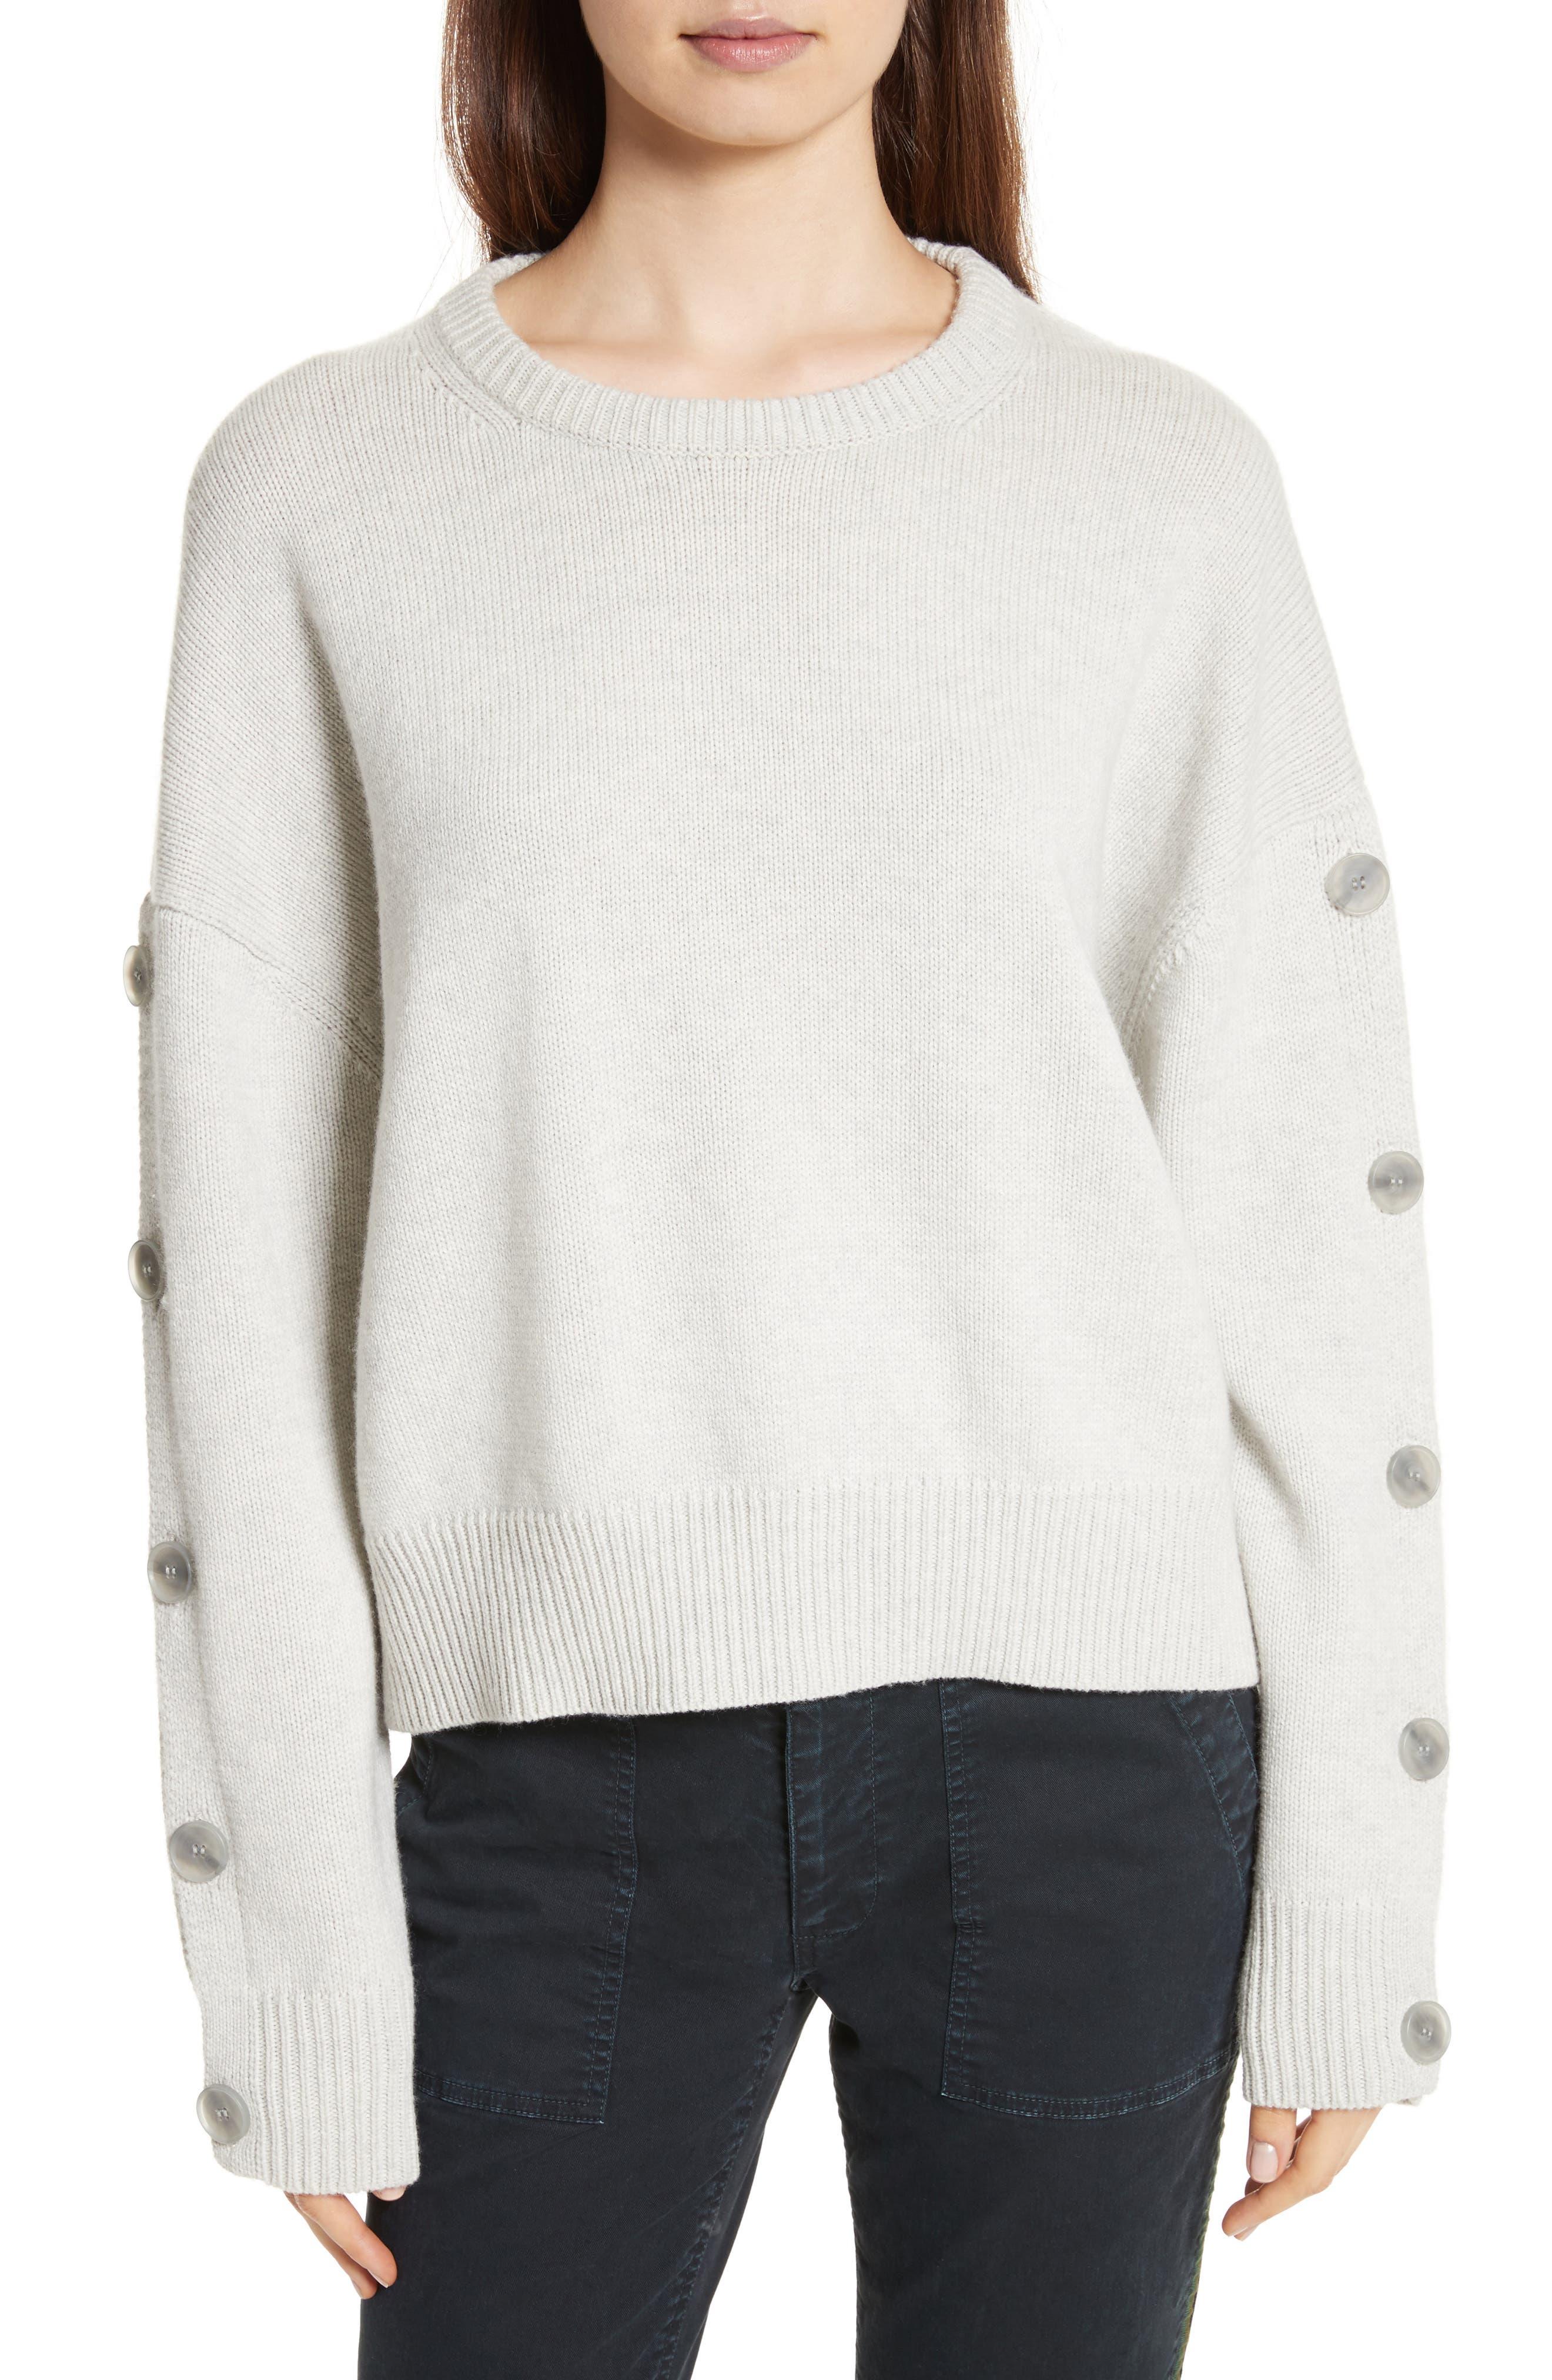 Alternate Image 1 Selected - Nili Lotan Martina Wool & Cashmere Sweater